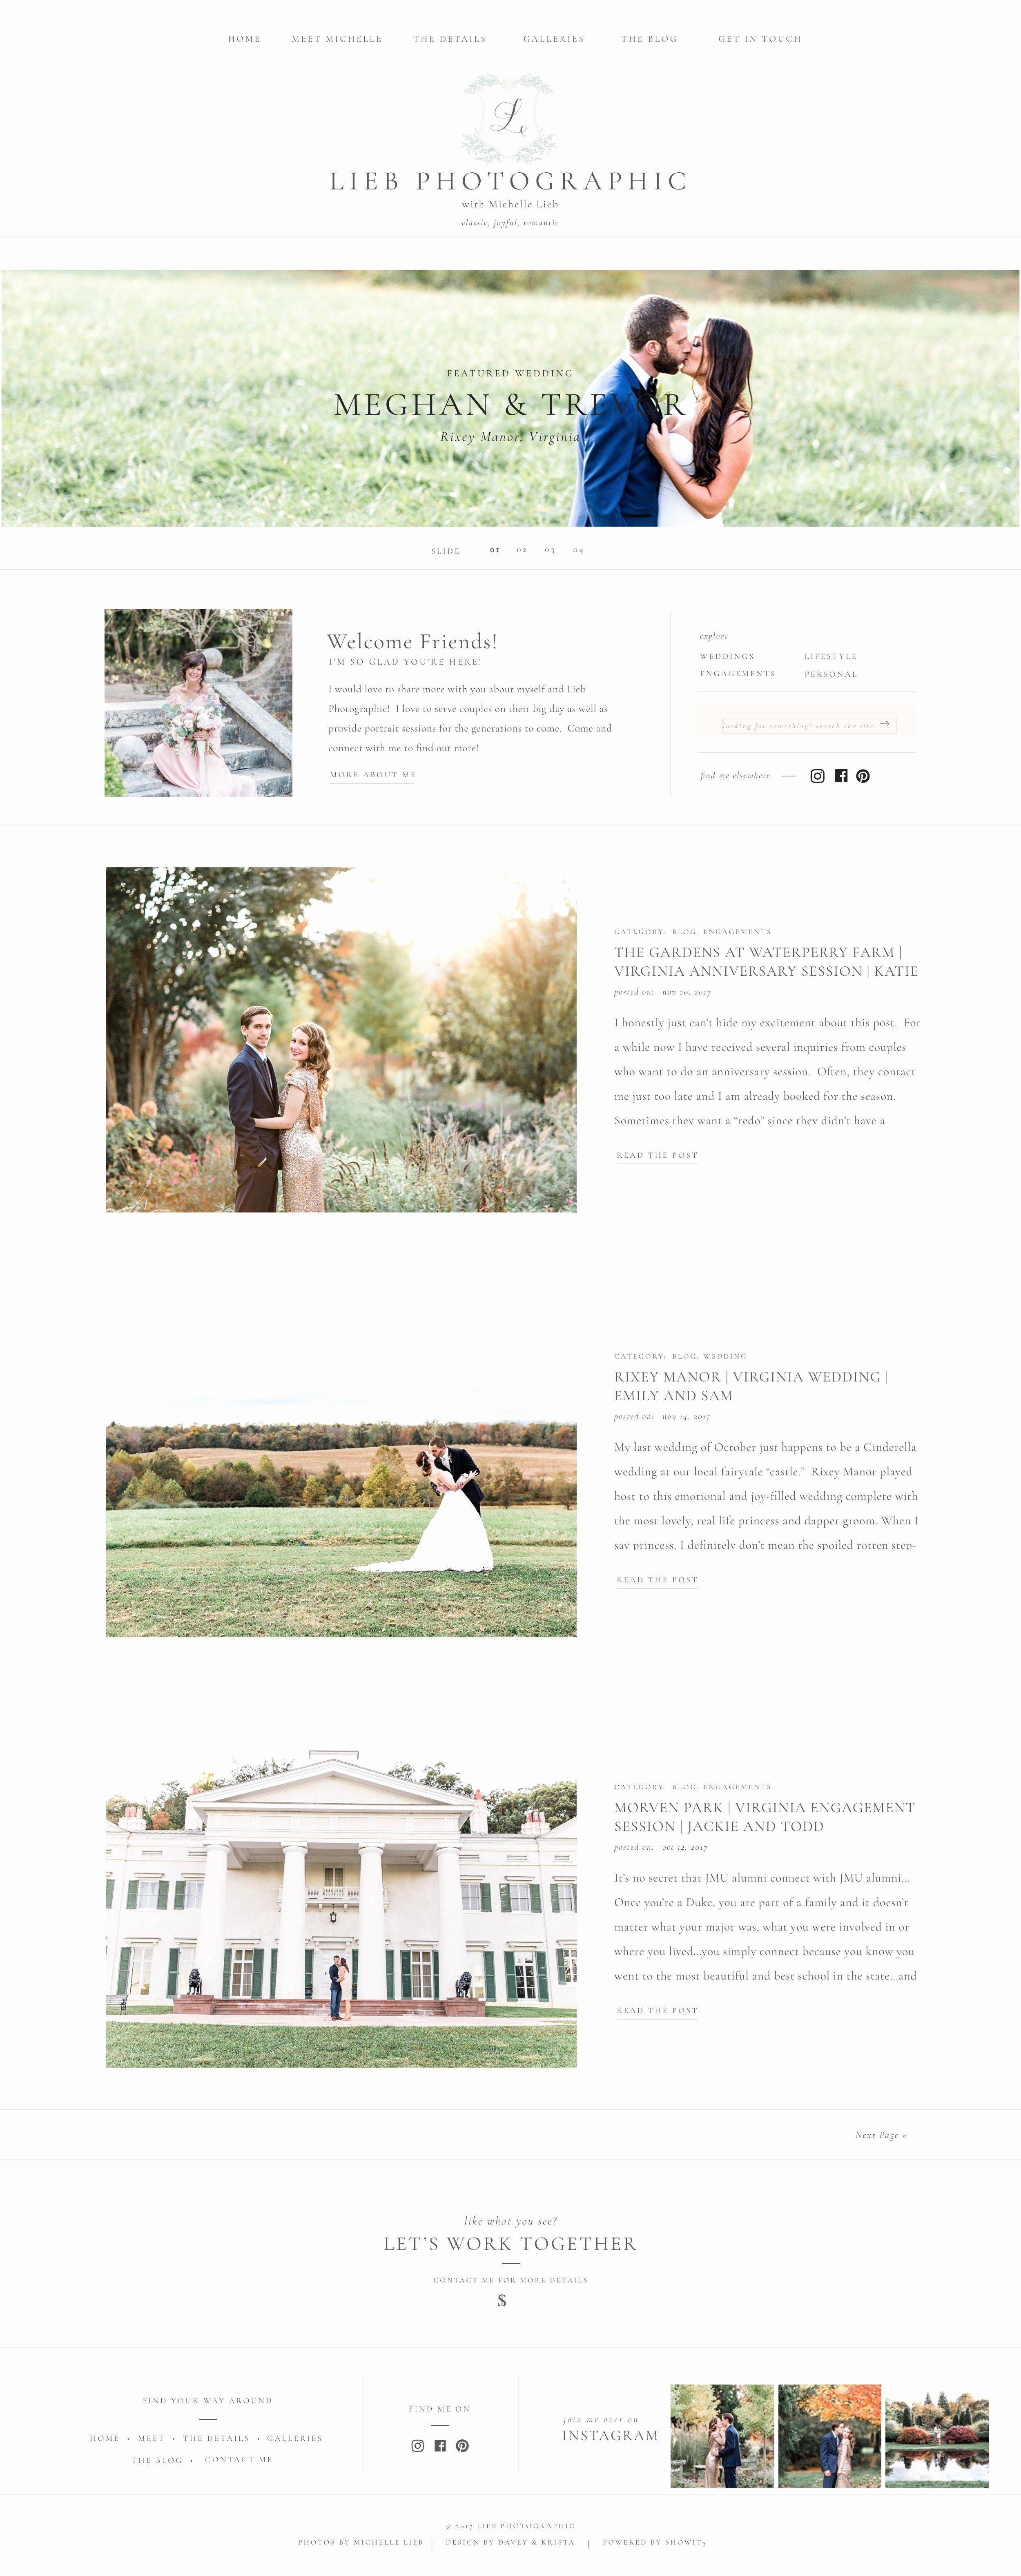 Clean Elegant Modern Website Templates for Photographers